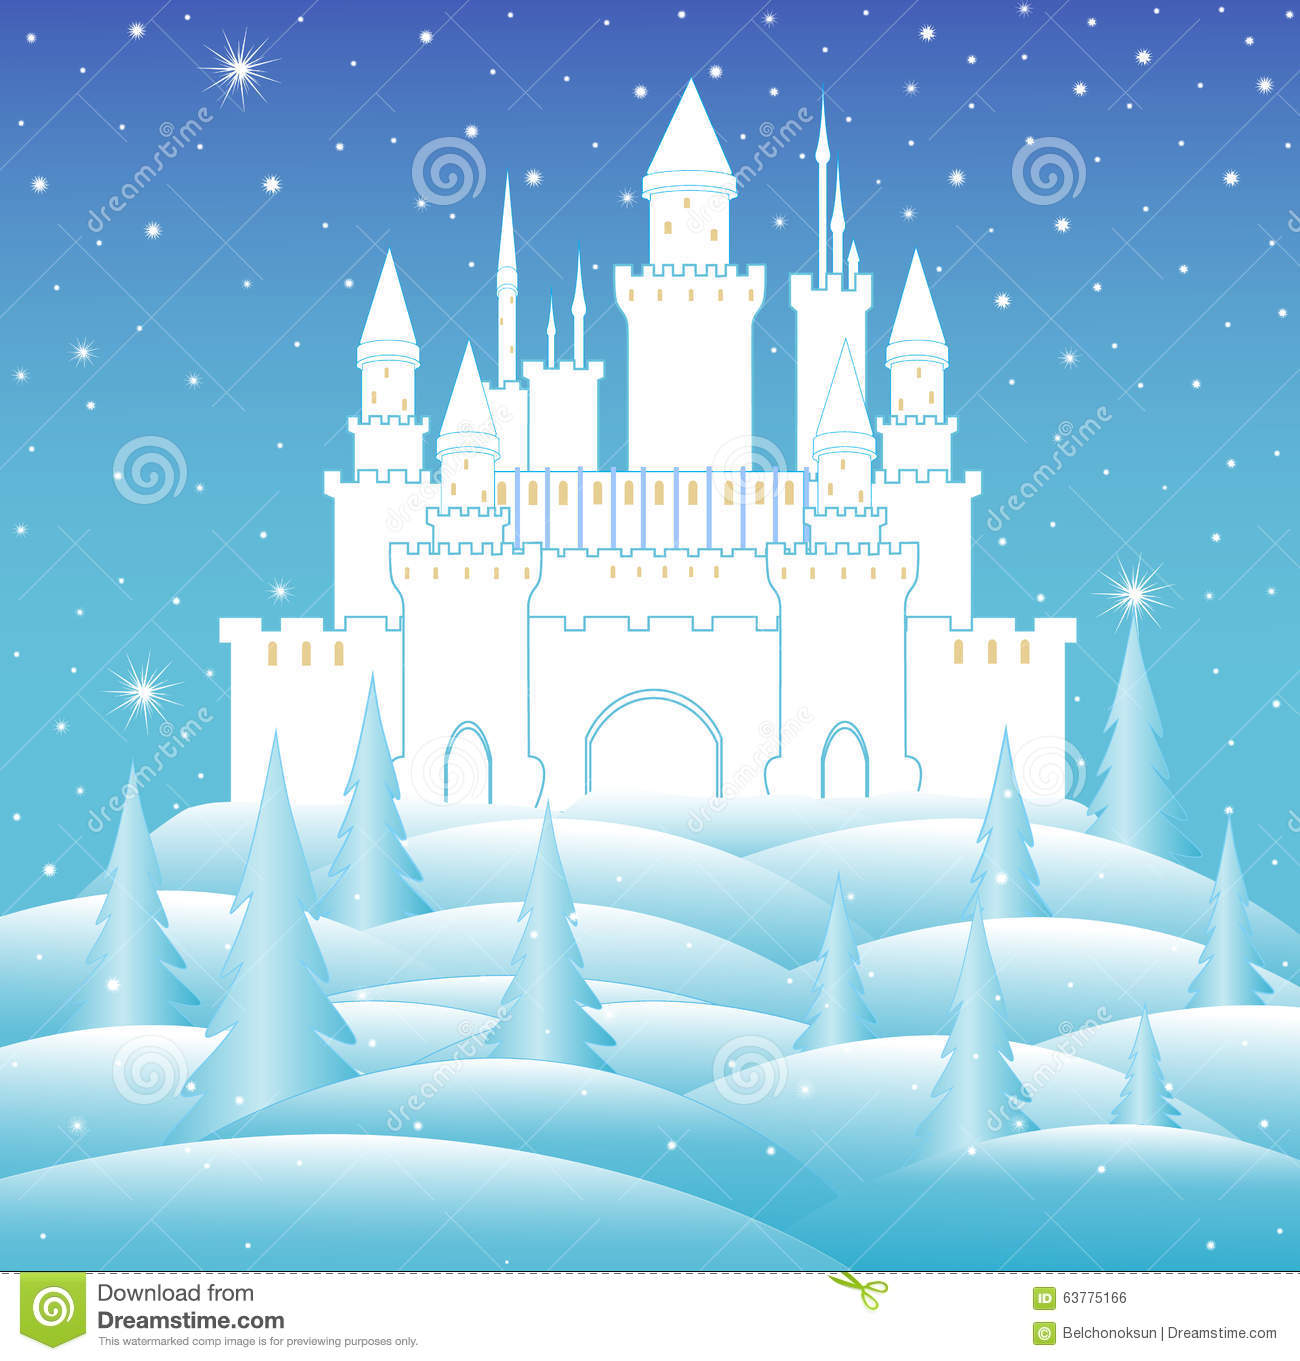 Ice Castle Clipart.